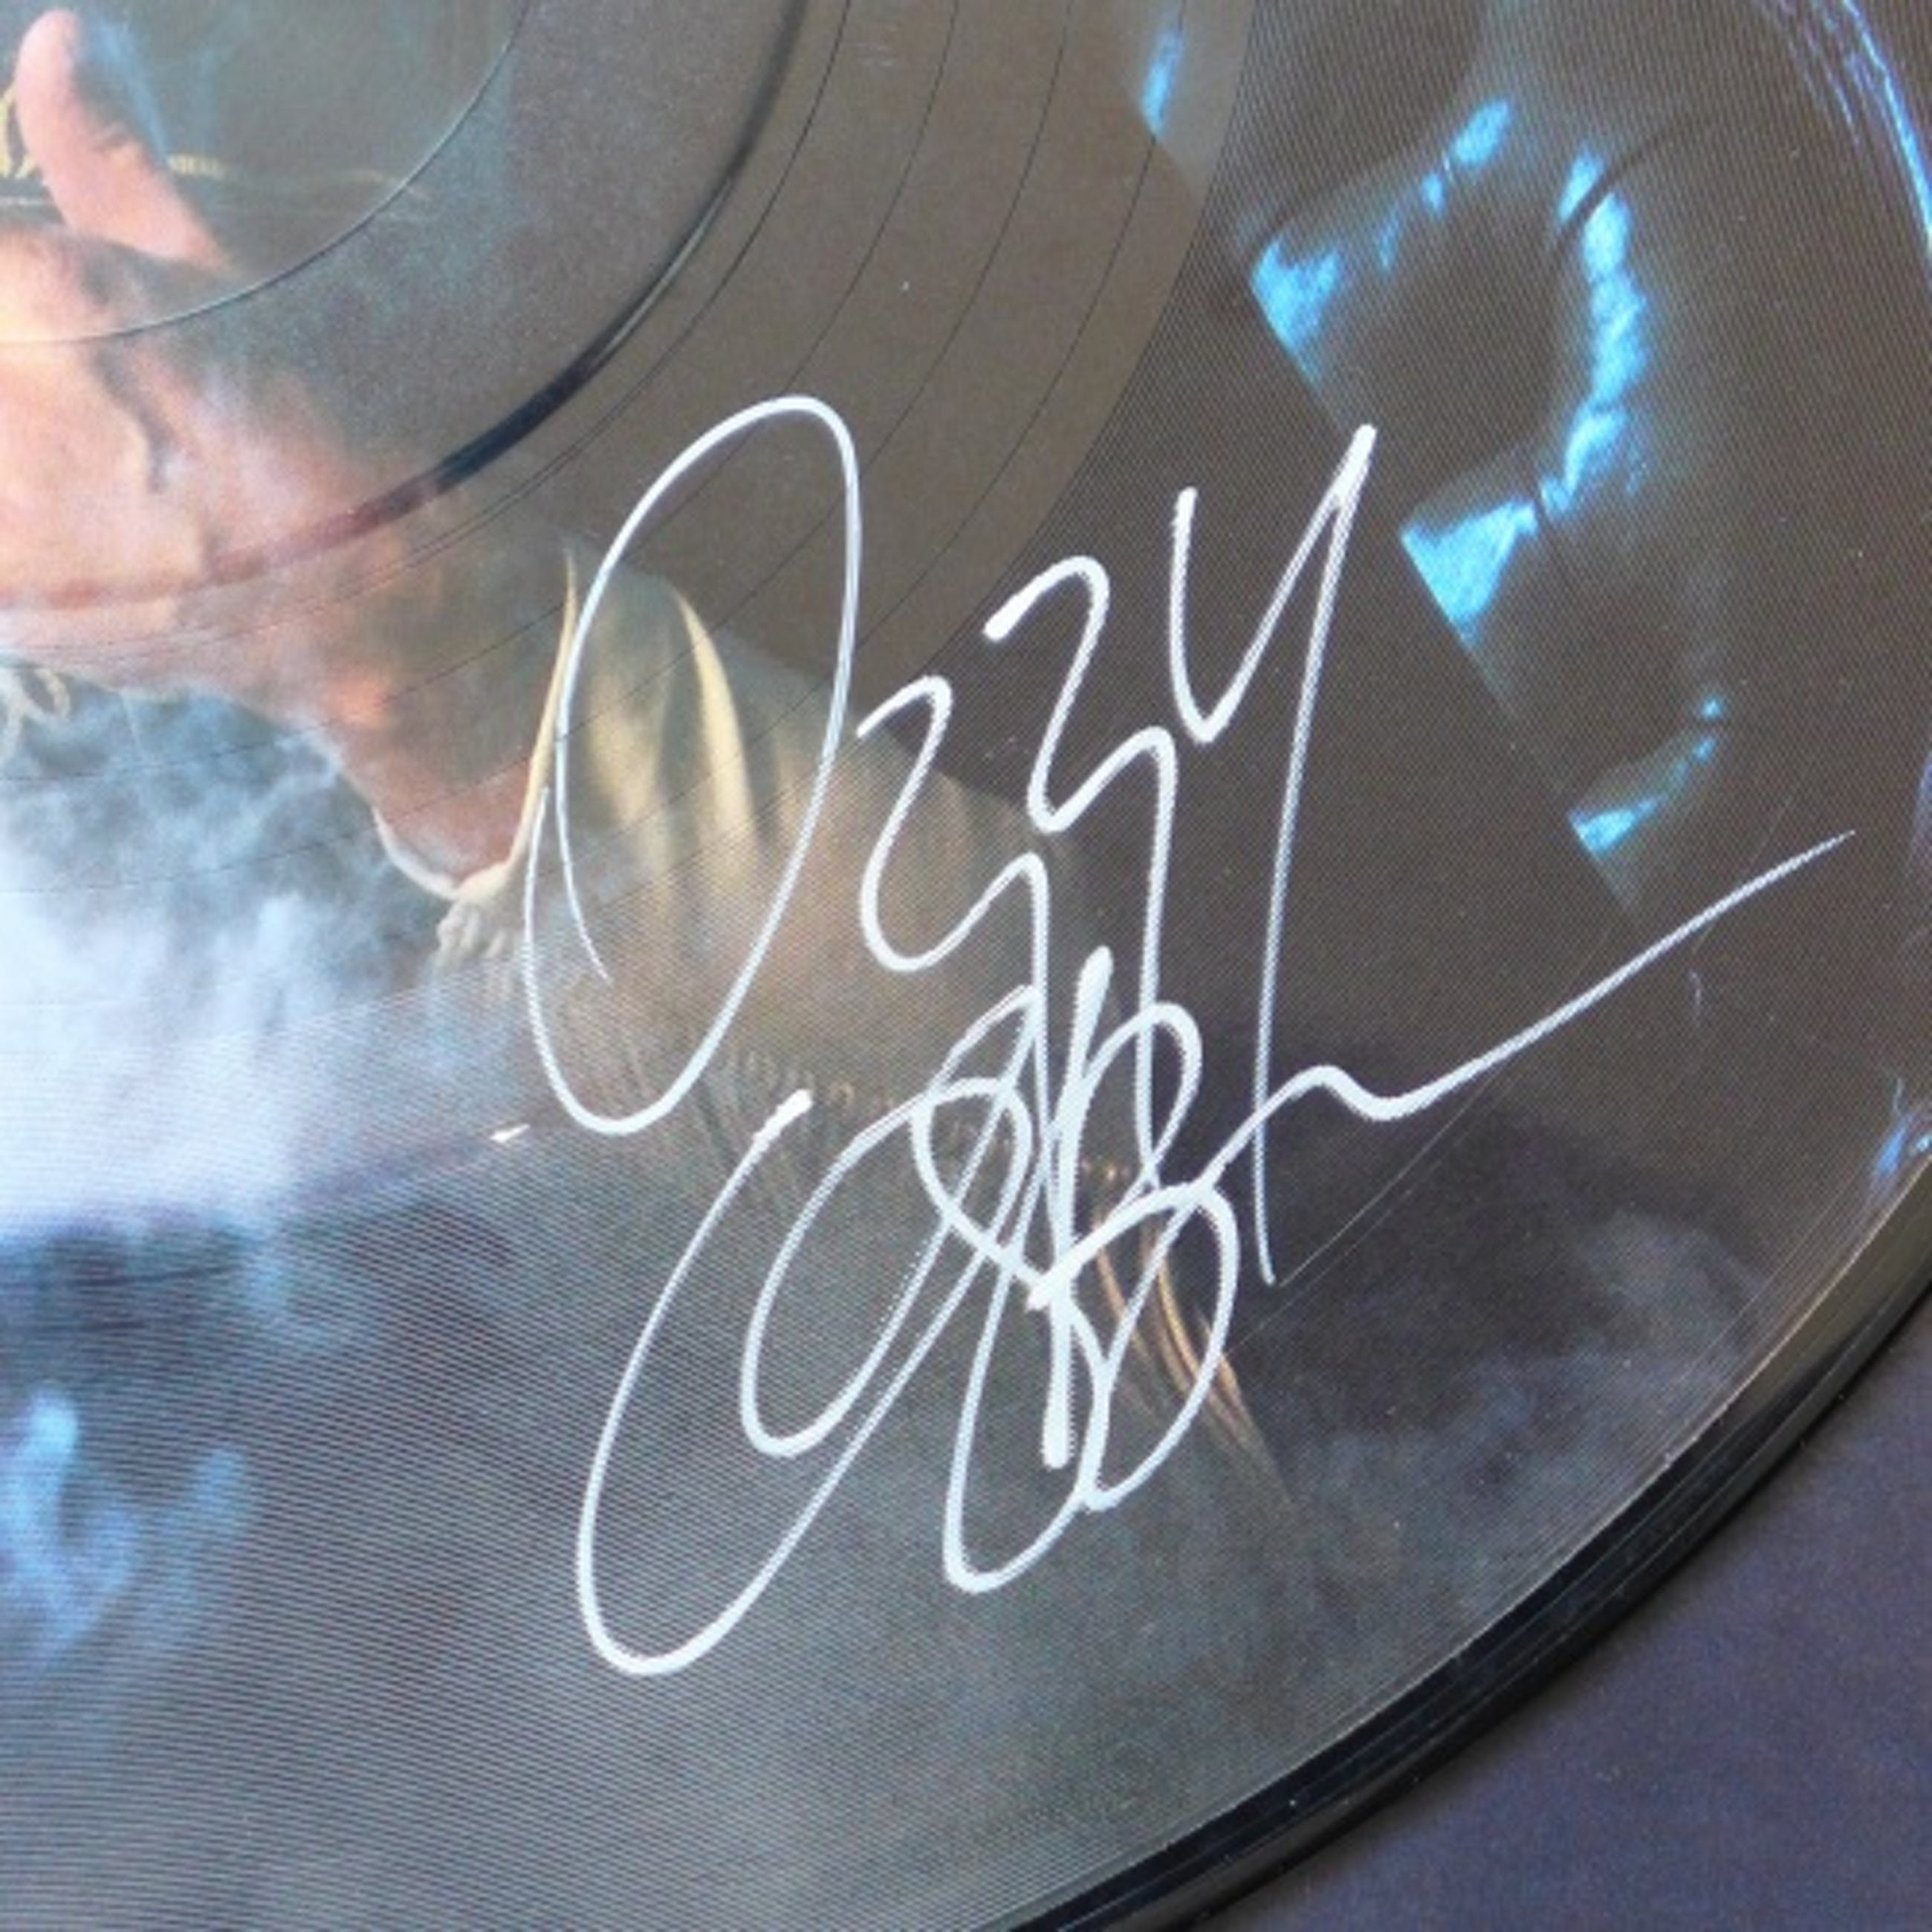 Ozzy Osbourne - Mr. Crowley Live, Picture Disc Maxi Single, signiert: Ozzy Osbourne kopen? Bied vanaf 49!